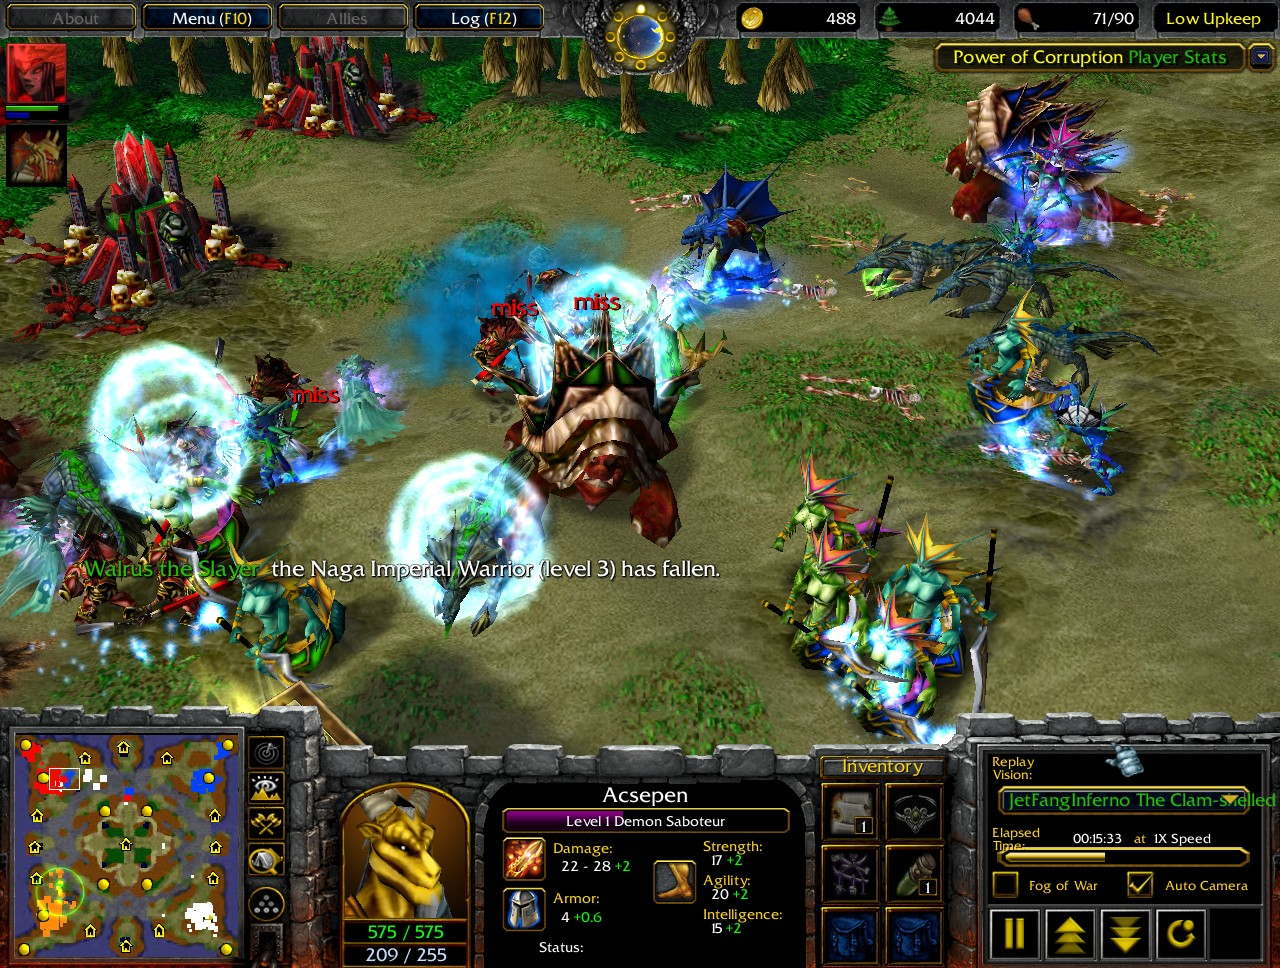 Warcraft3 sex map nude gallery